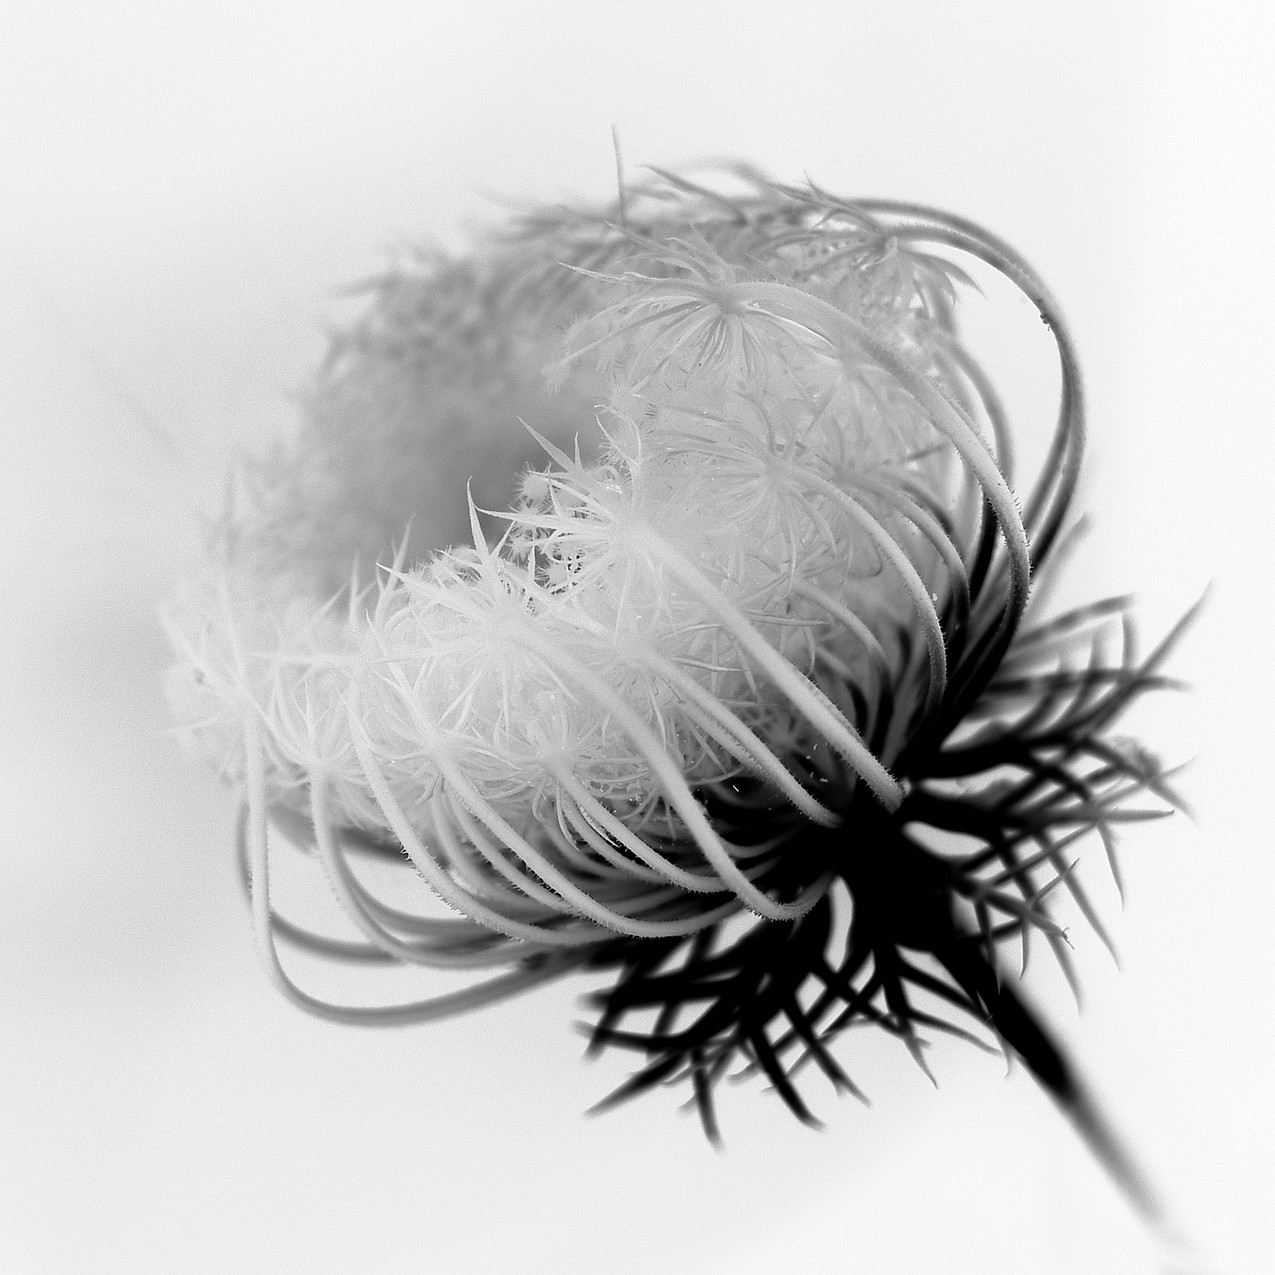 blossPro selinum 04